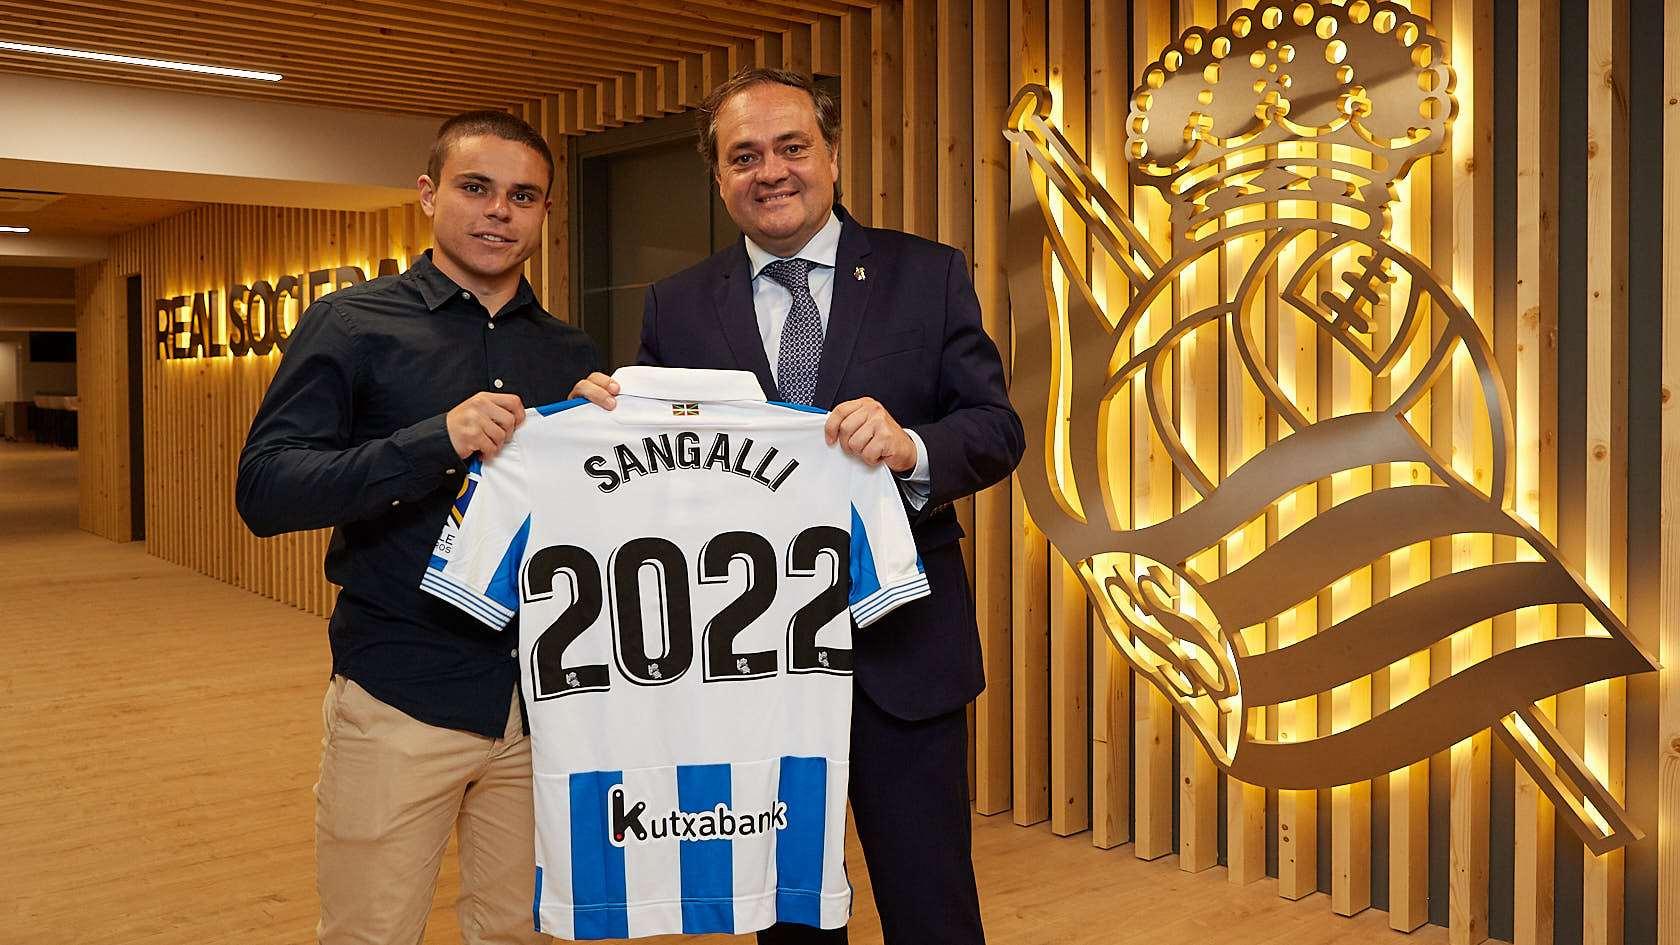 ¿Cuánto mide Luca Sangalli? 5d2_7403_945_